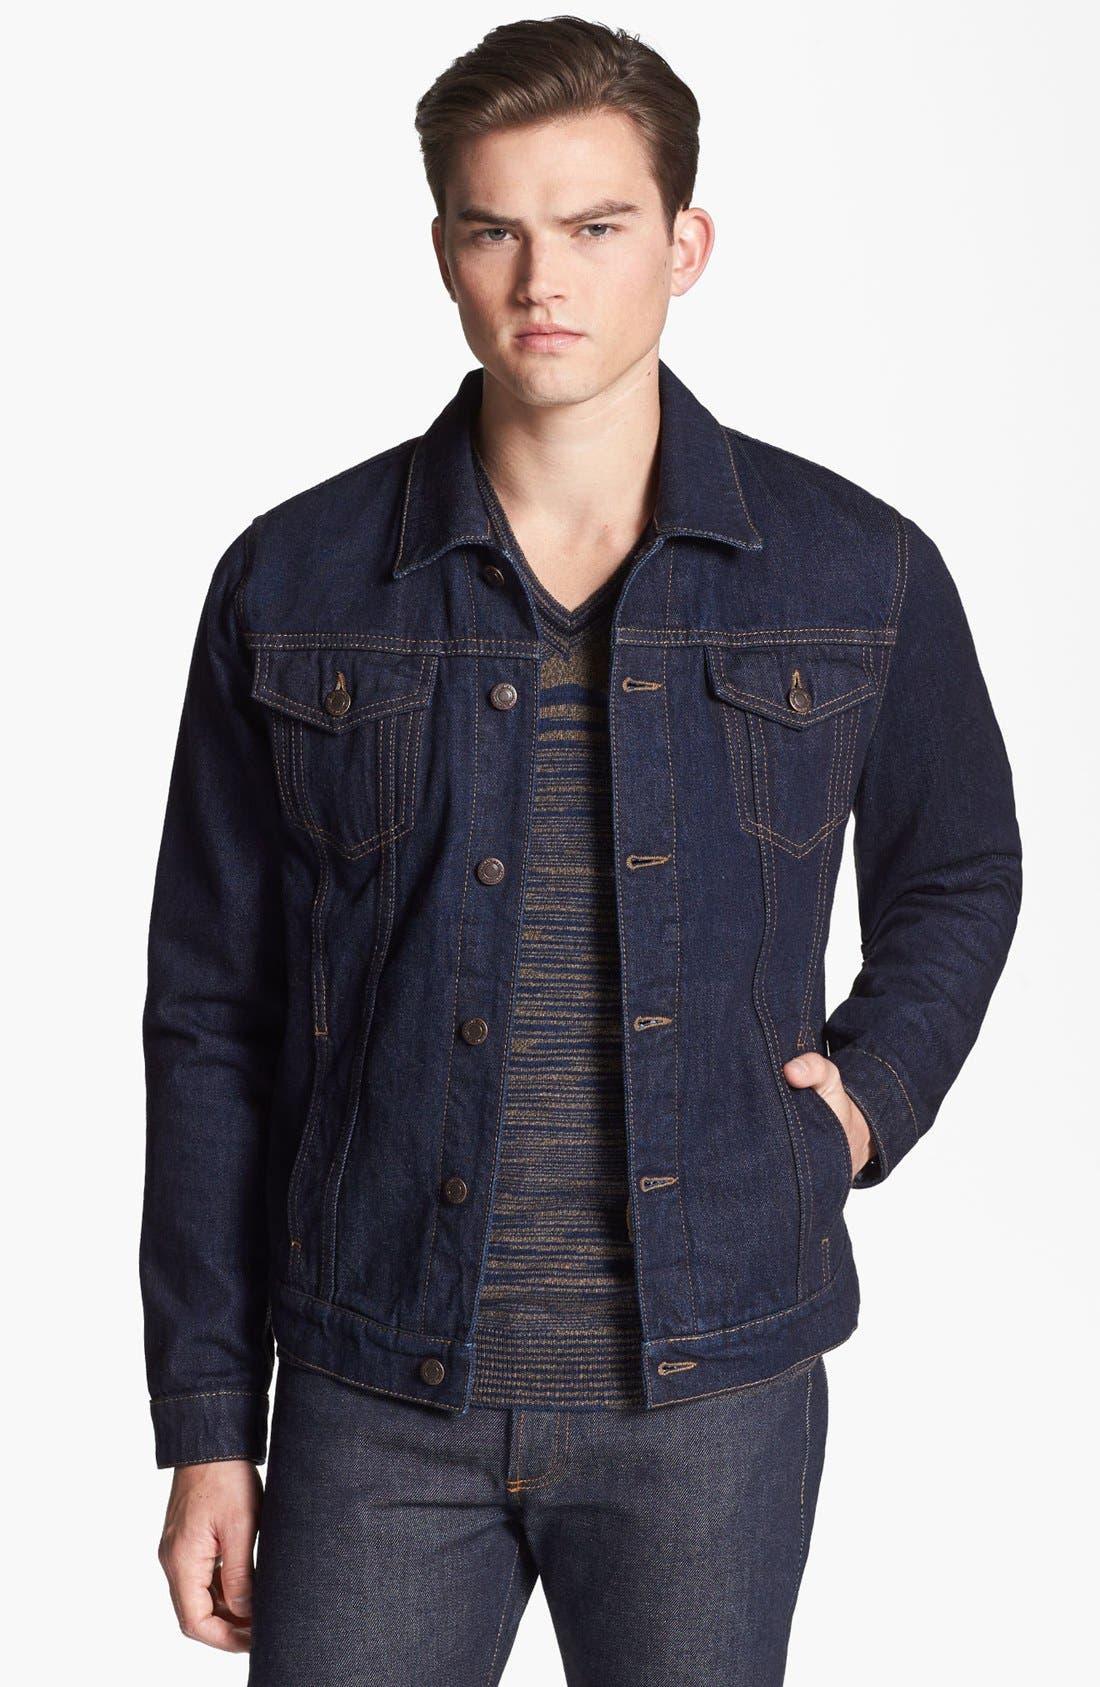 Alternate Image 1 Selected - Missoni Denim Jacket with Removable Vest